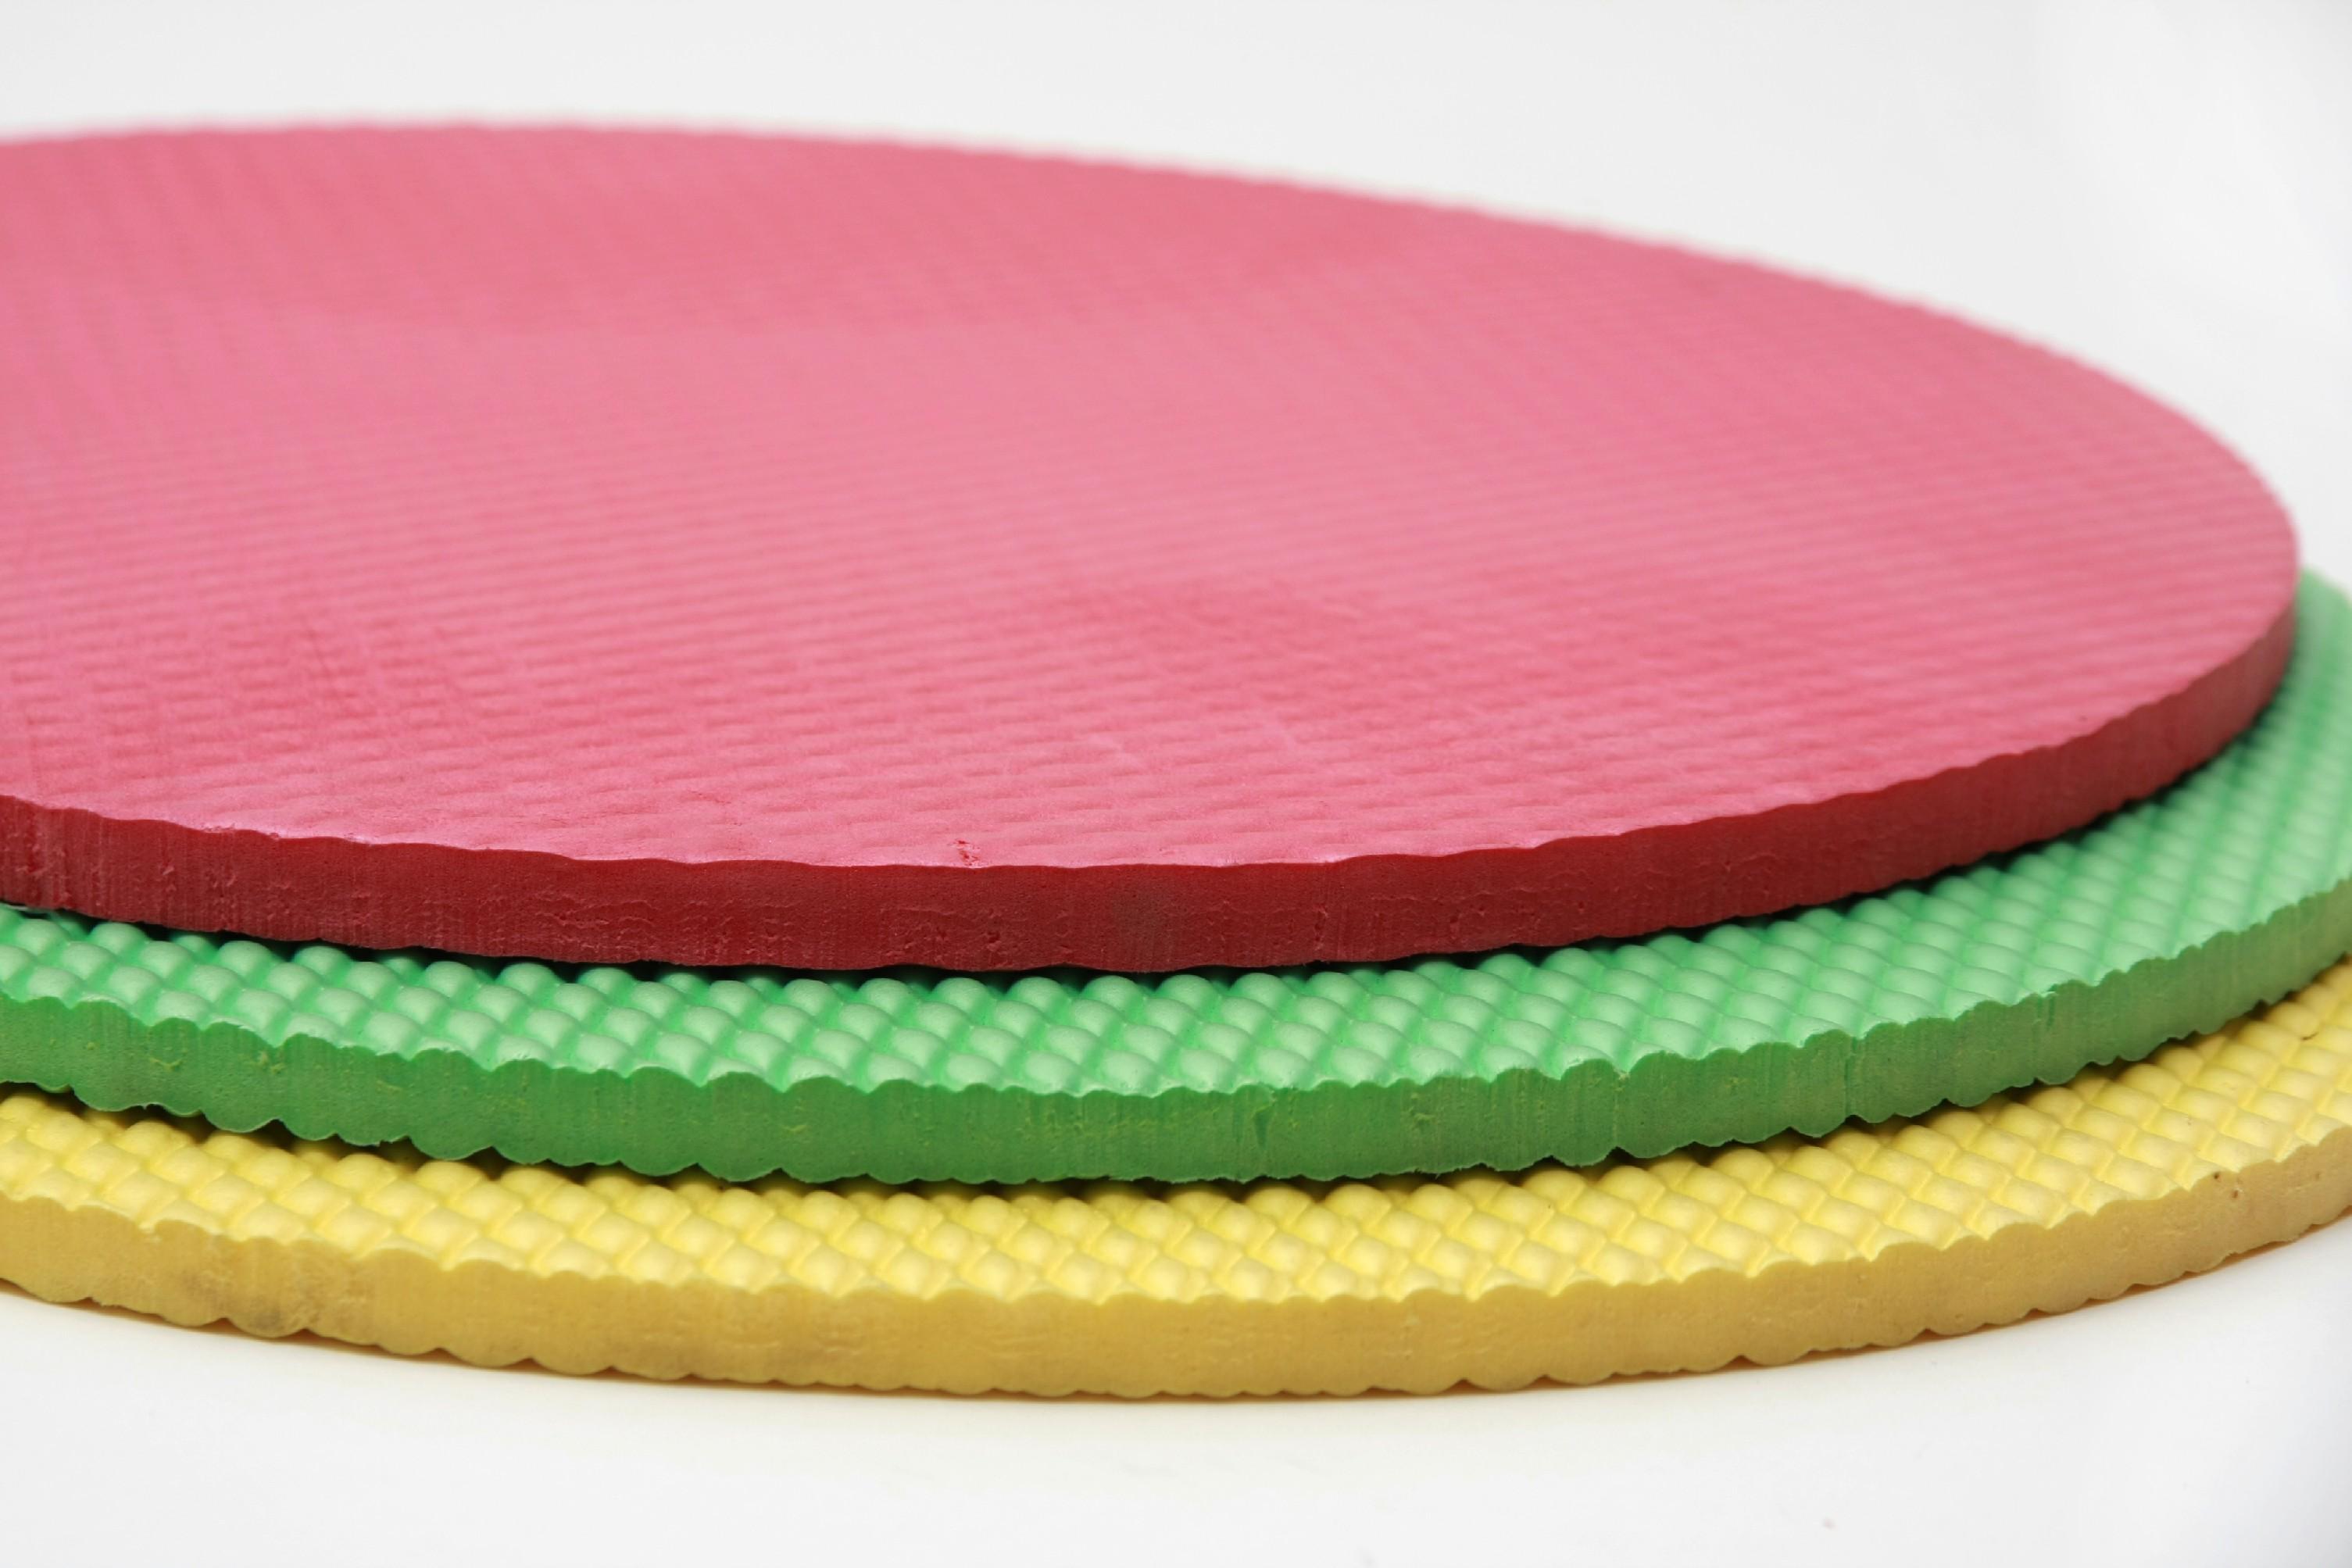 Velký kruh Barva: Žlutá